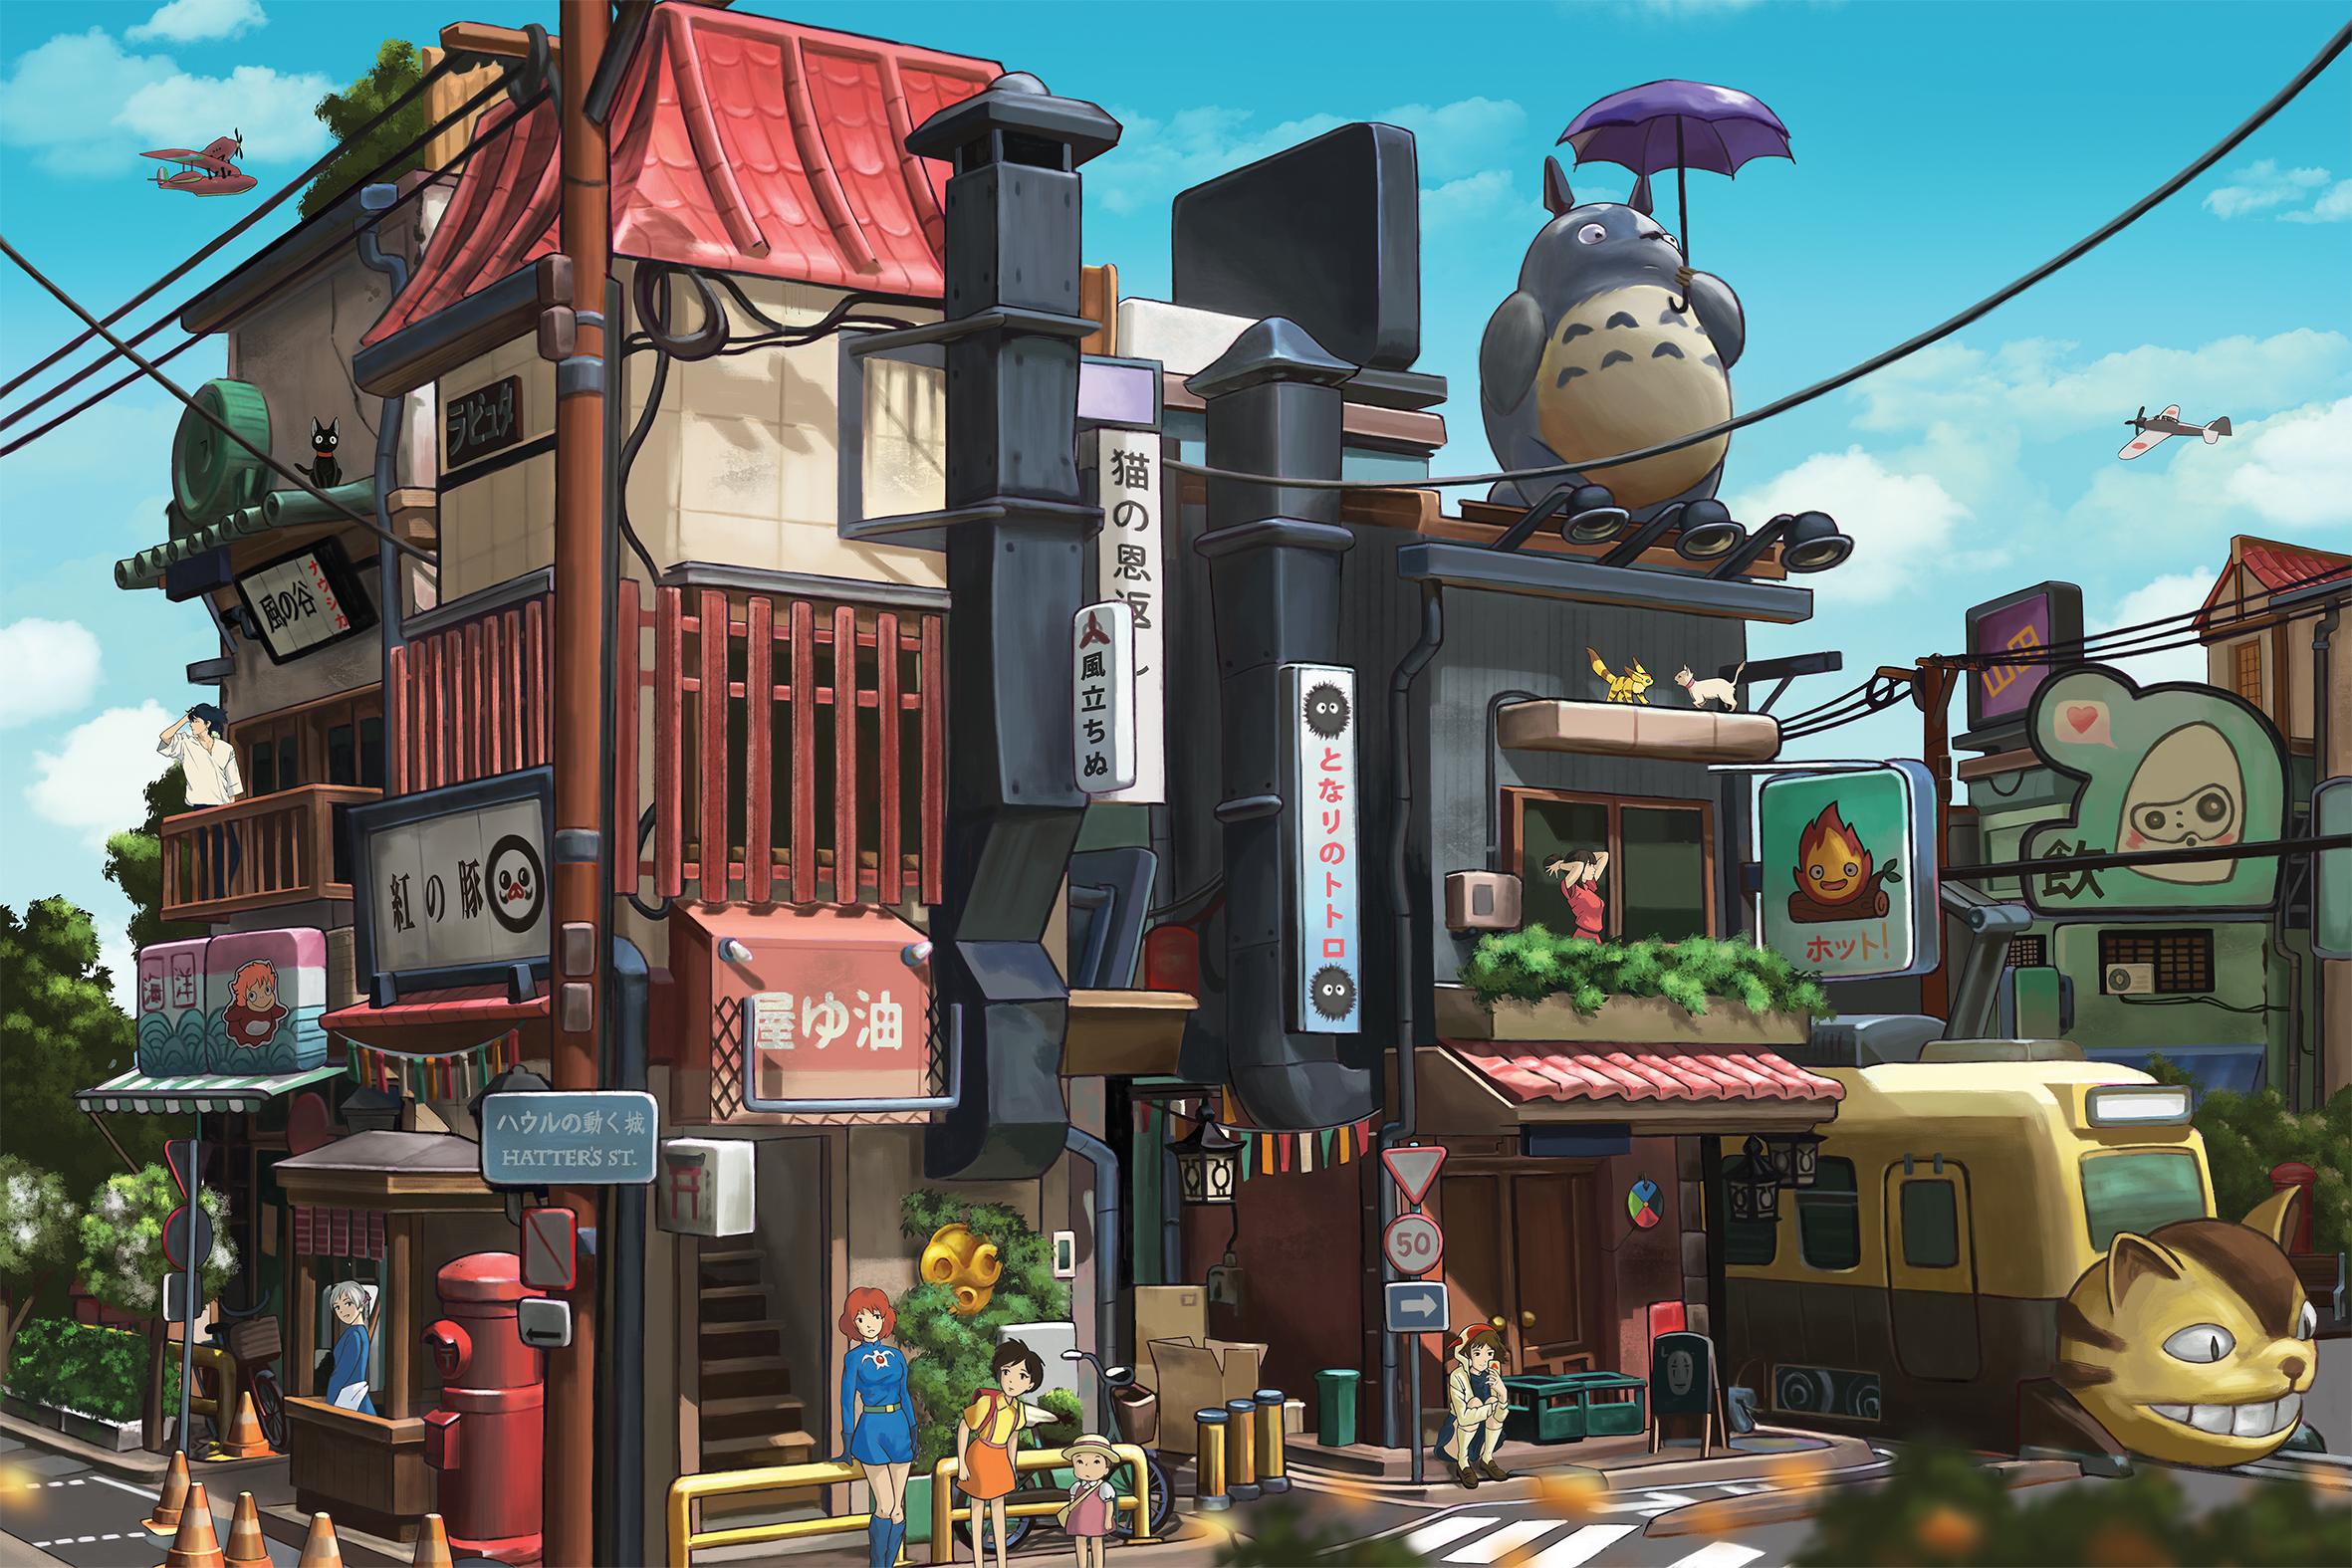 Ghibli street